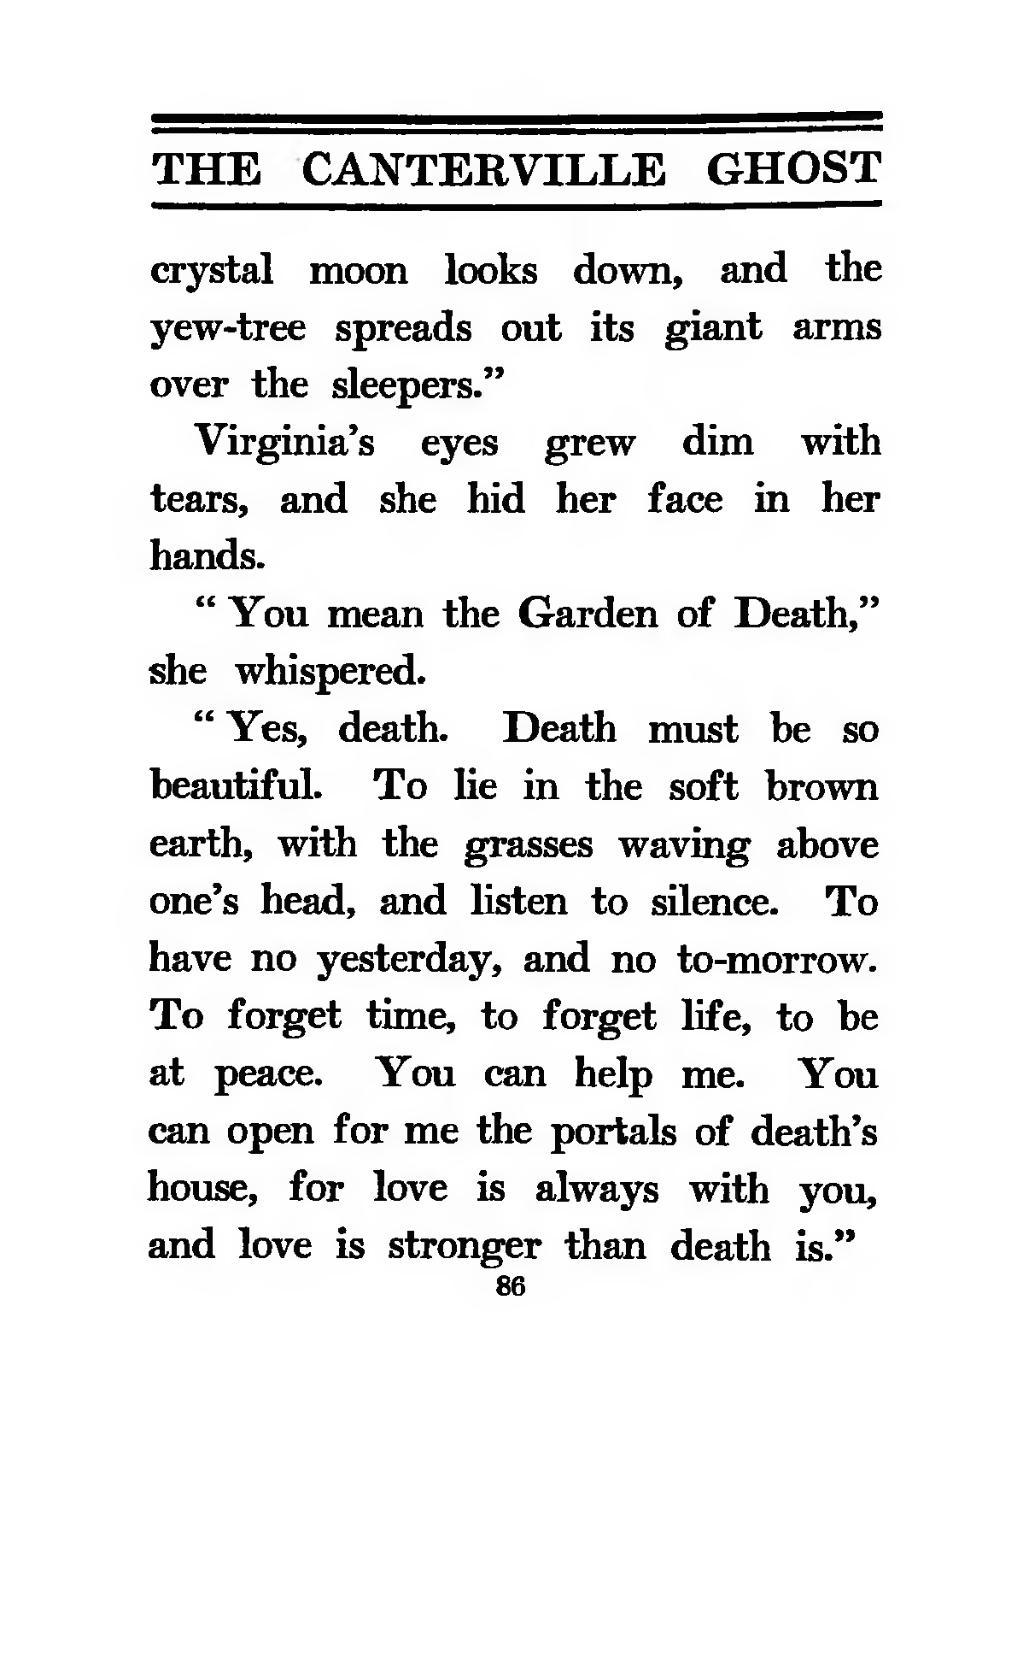 Love must not be forgotten pdf